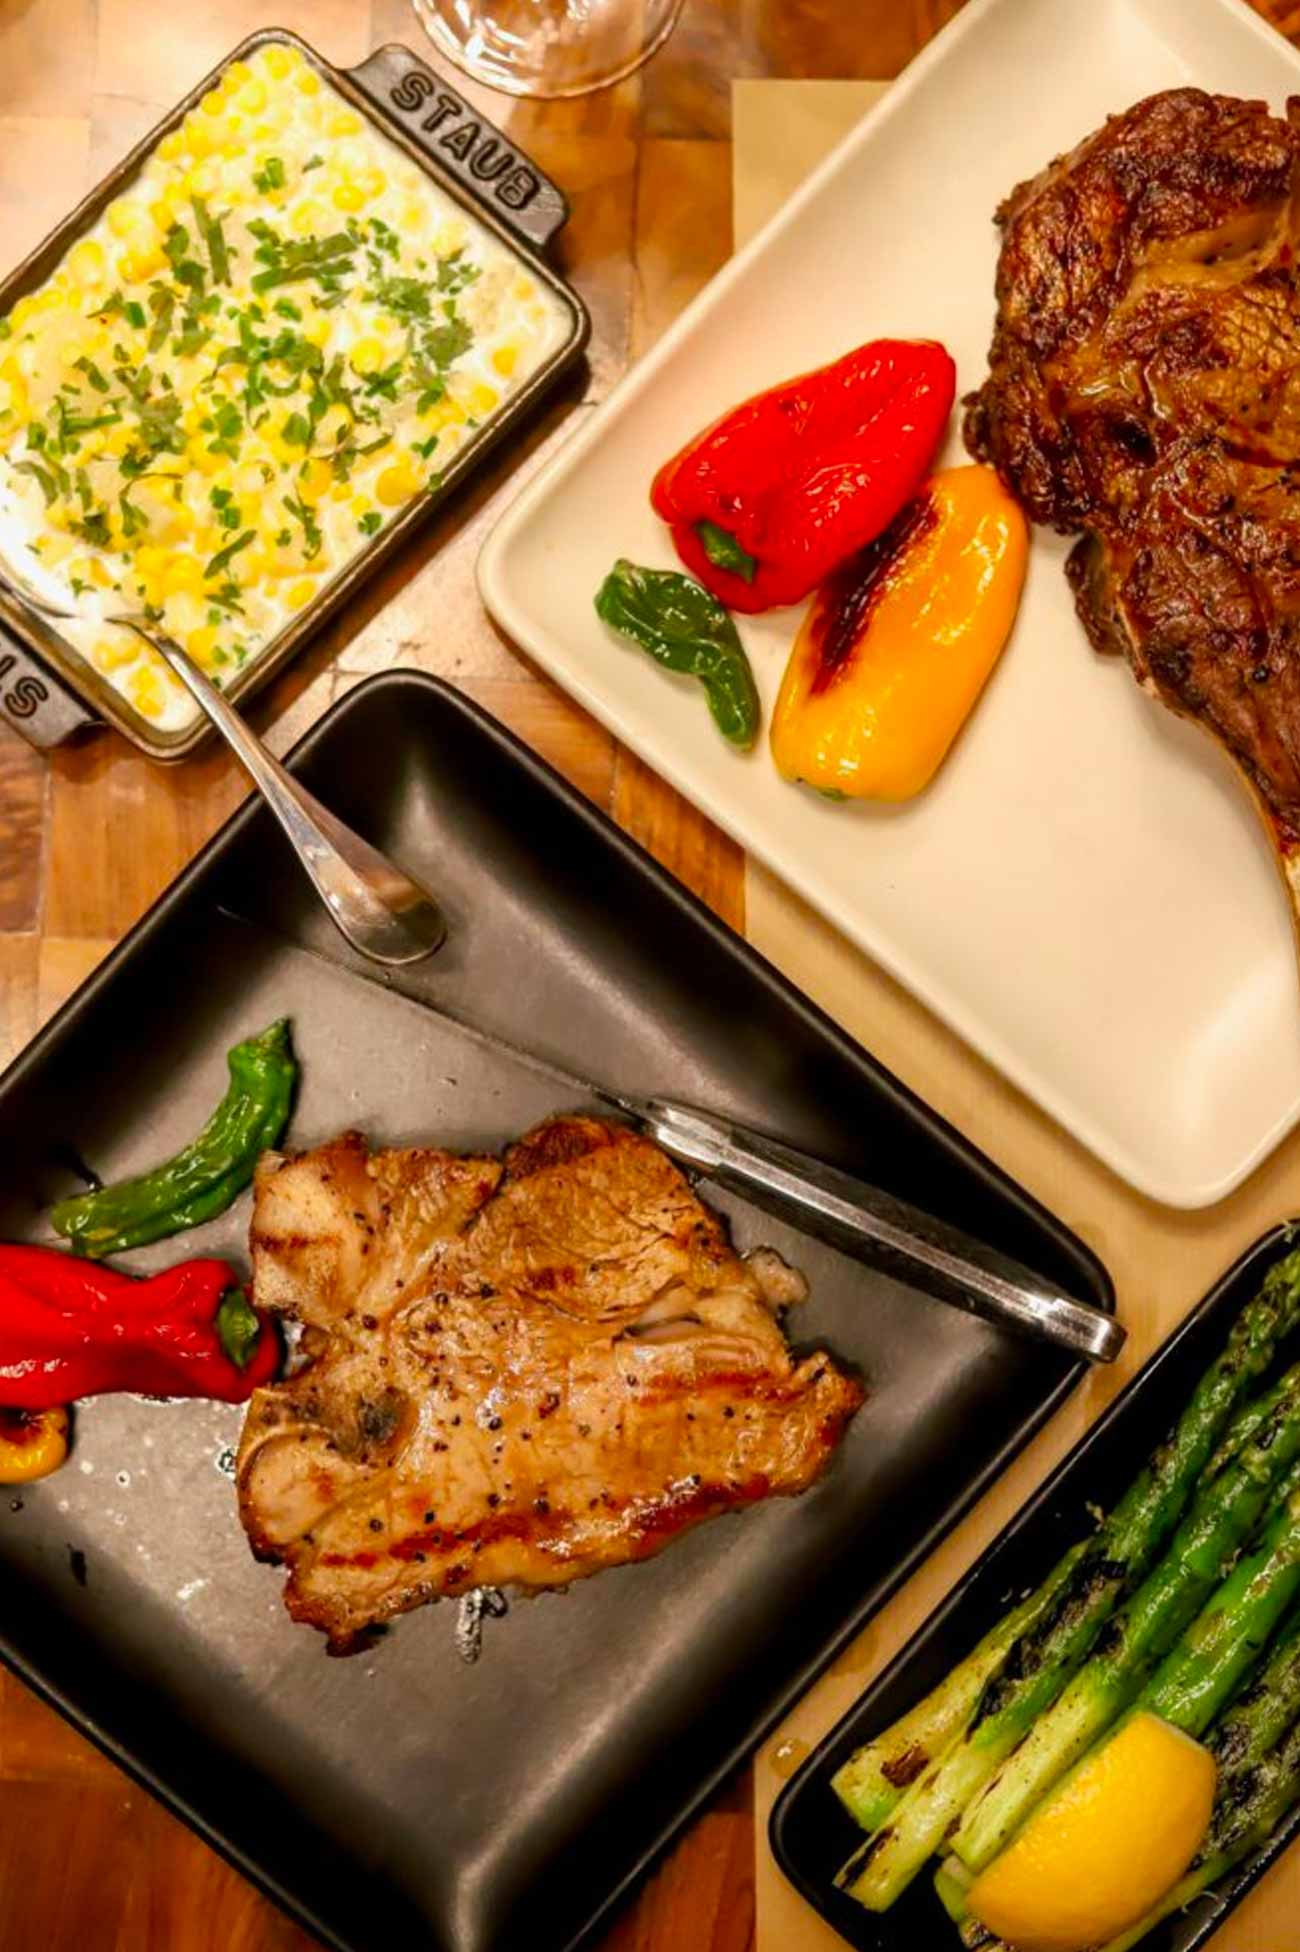 Veal Porterhouse, Bone-In Ribeye , Creamy Corn and Lime & Asparagus